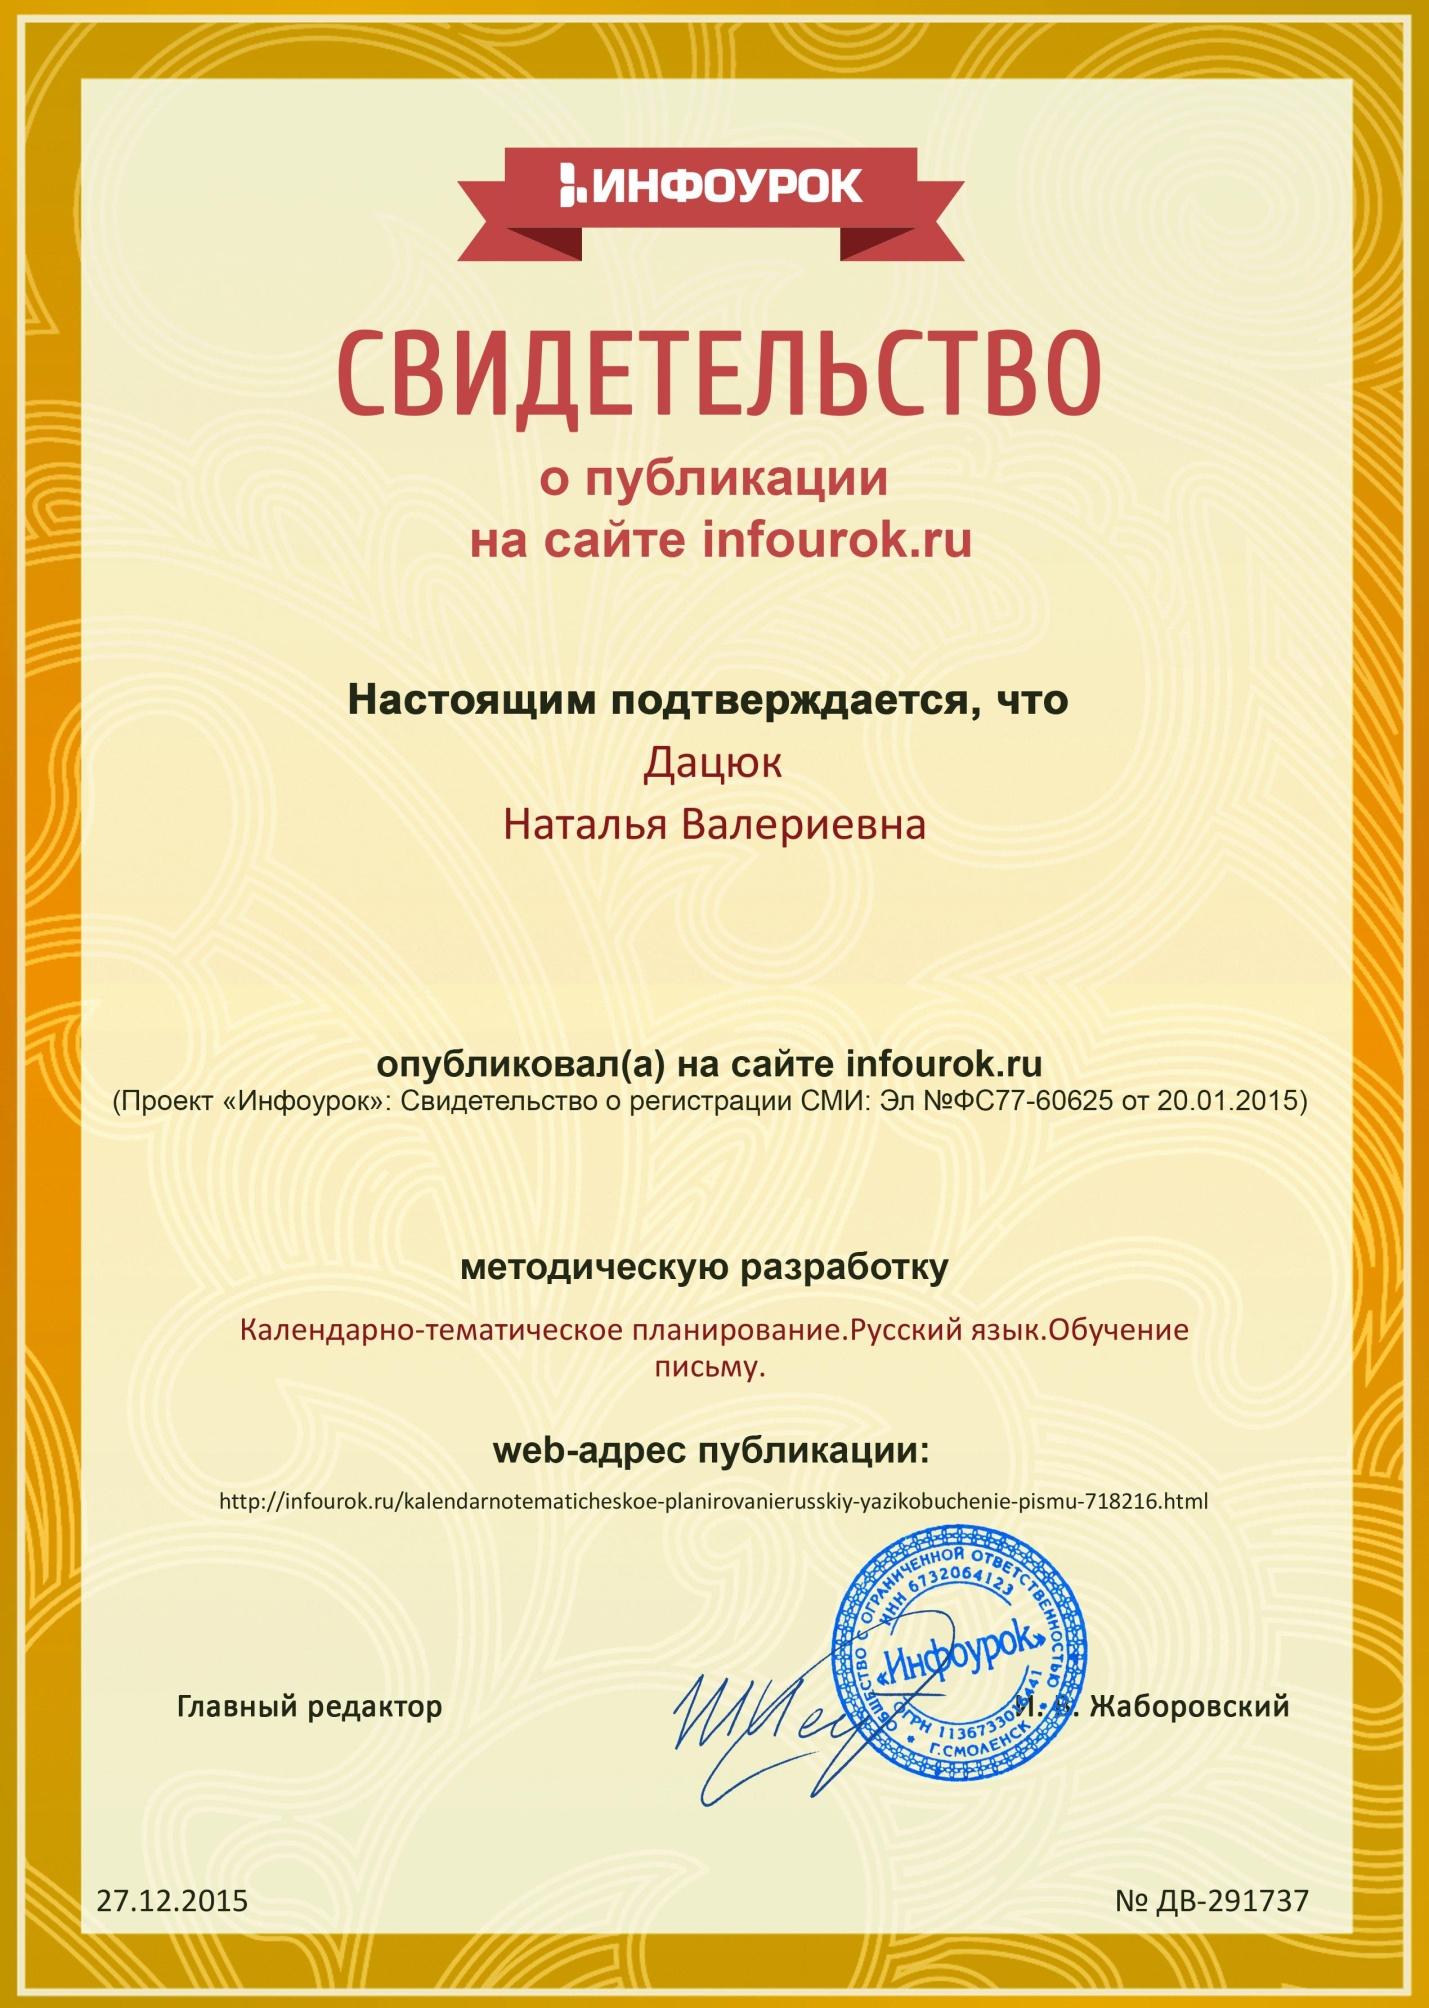 Сертификат проекта infourok.ru № ДВ-291737.jpg